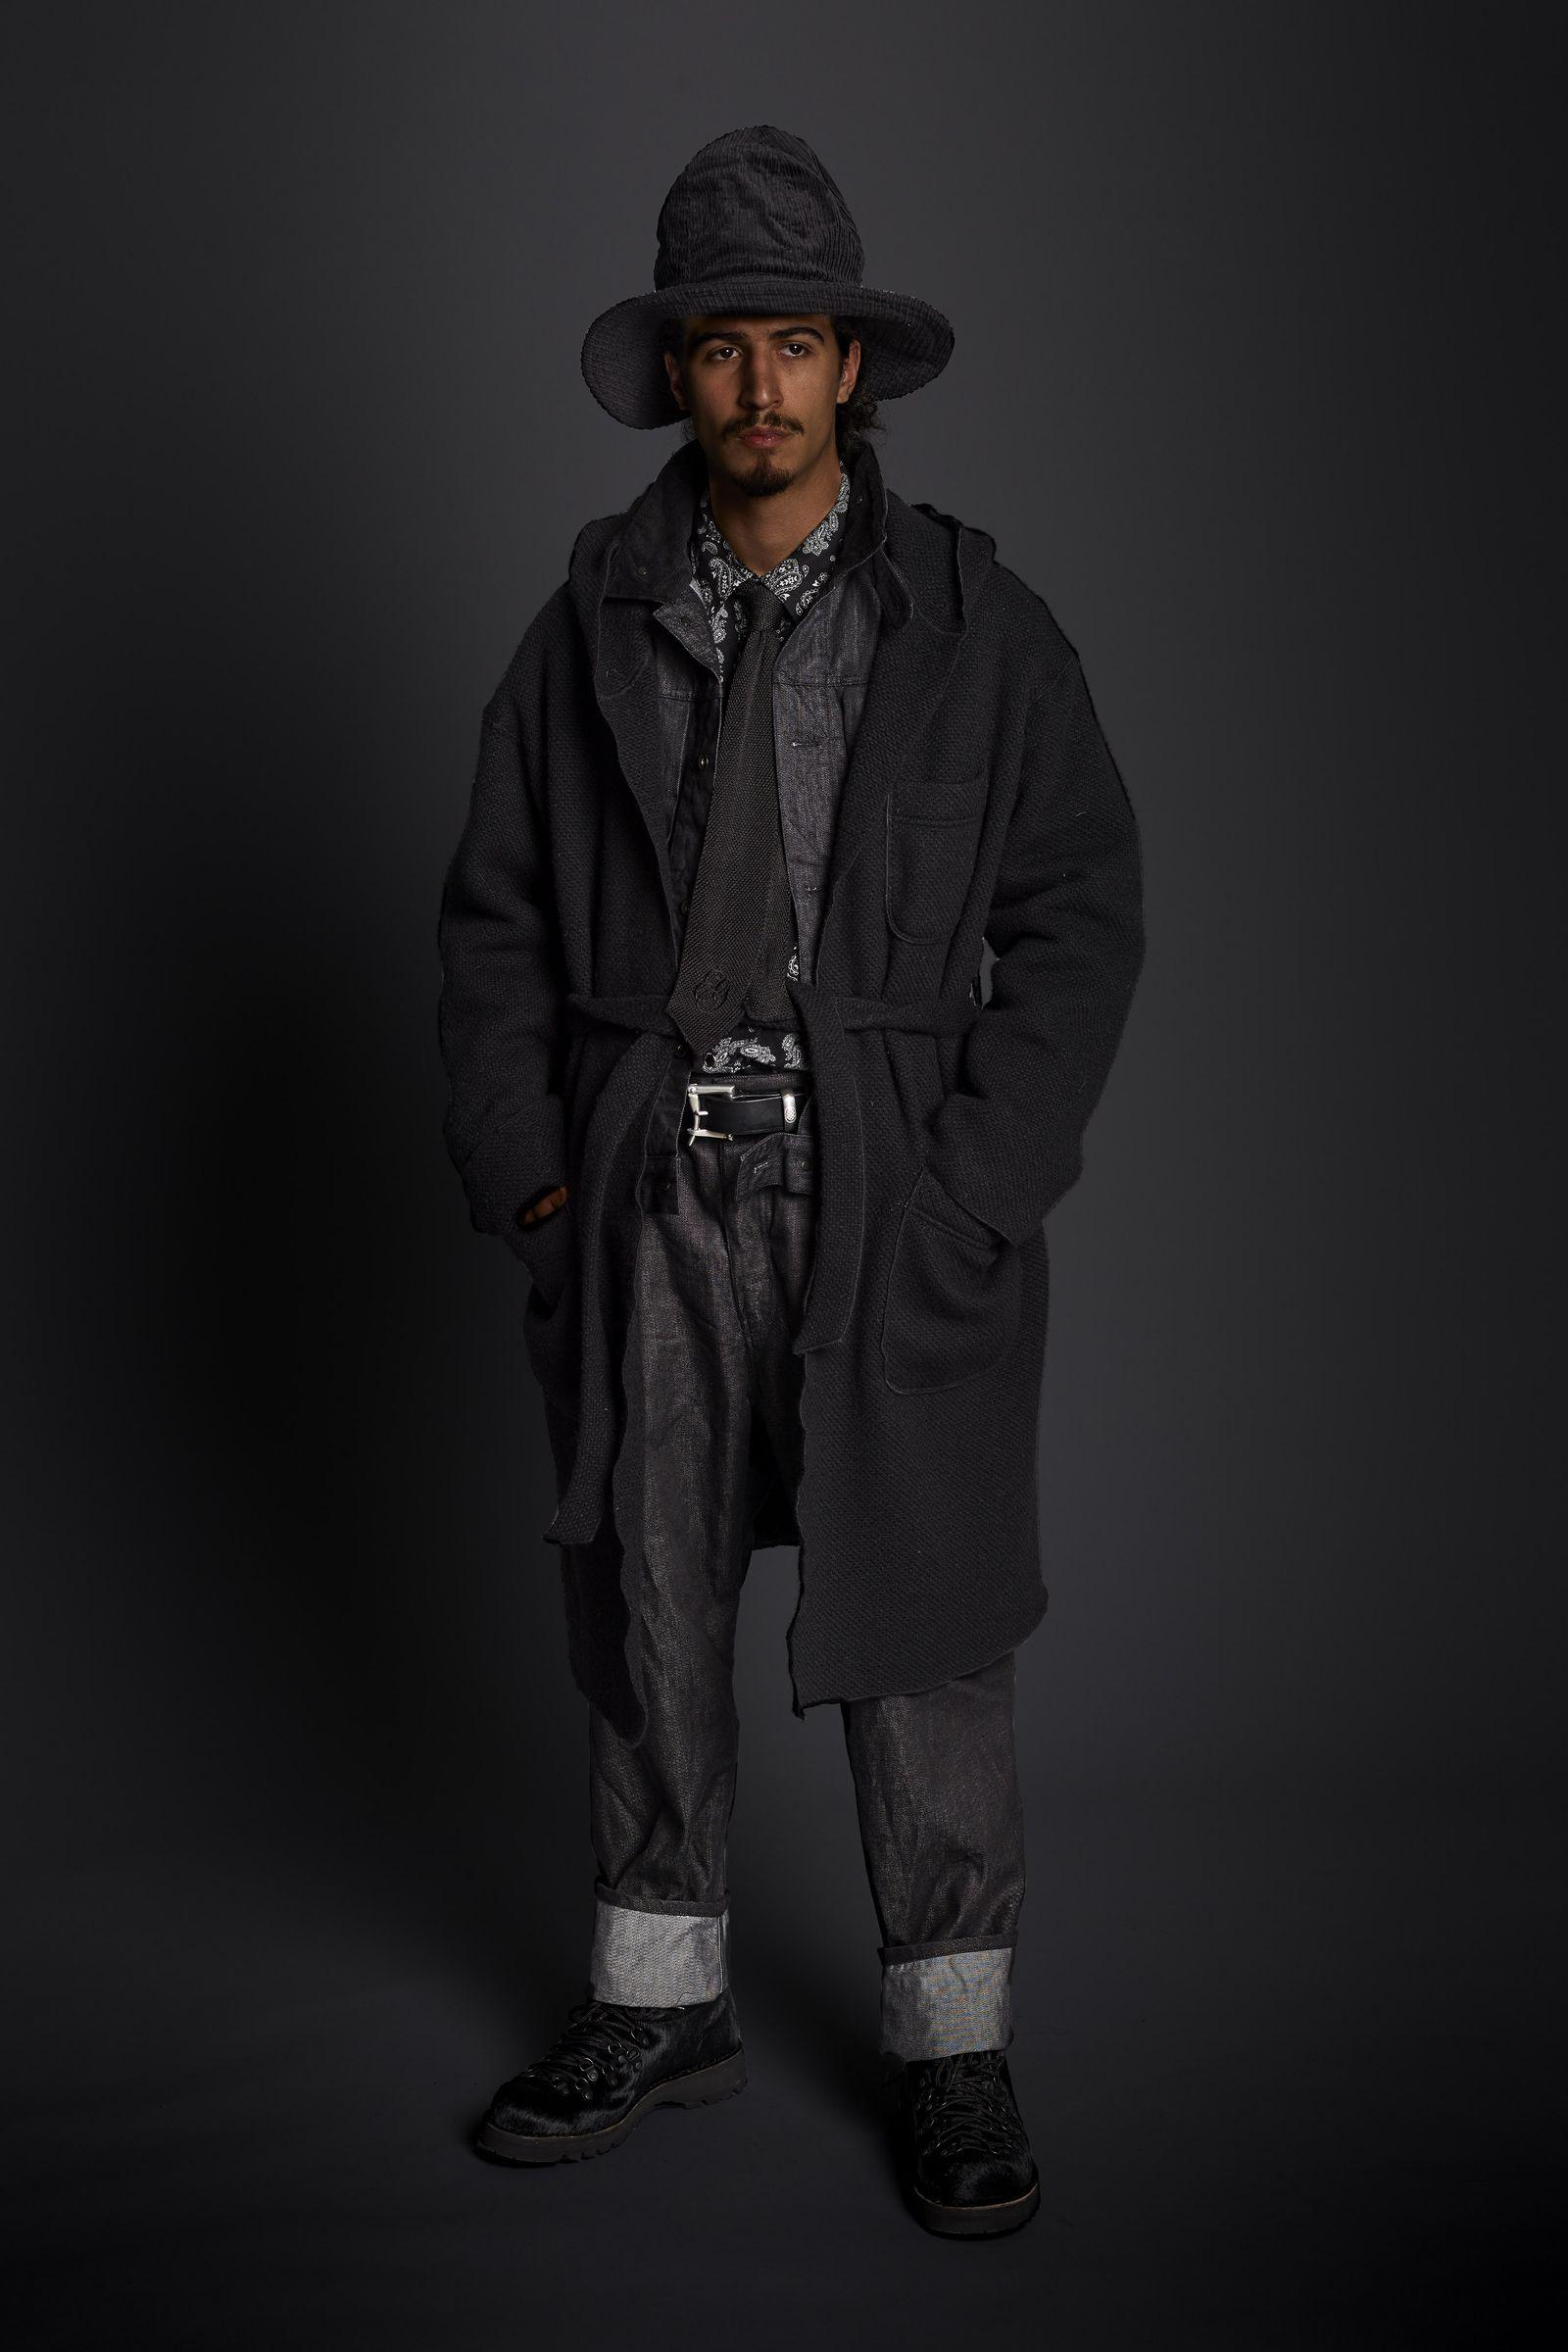 engineered-garments-fall-winter-2020-30